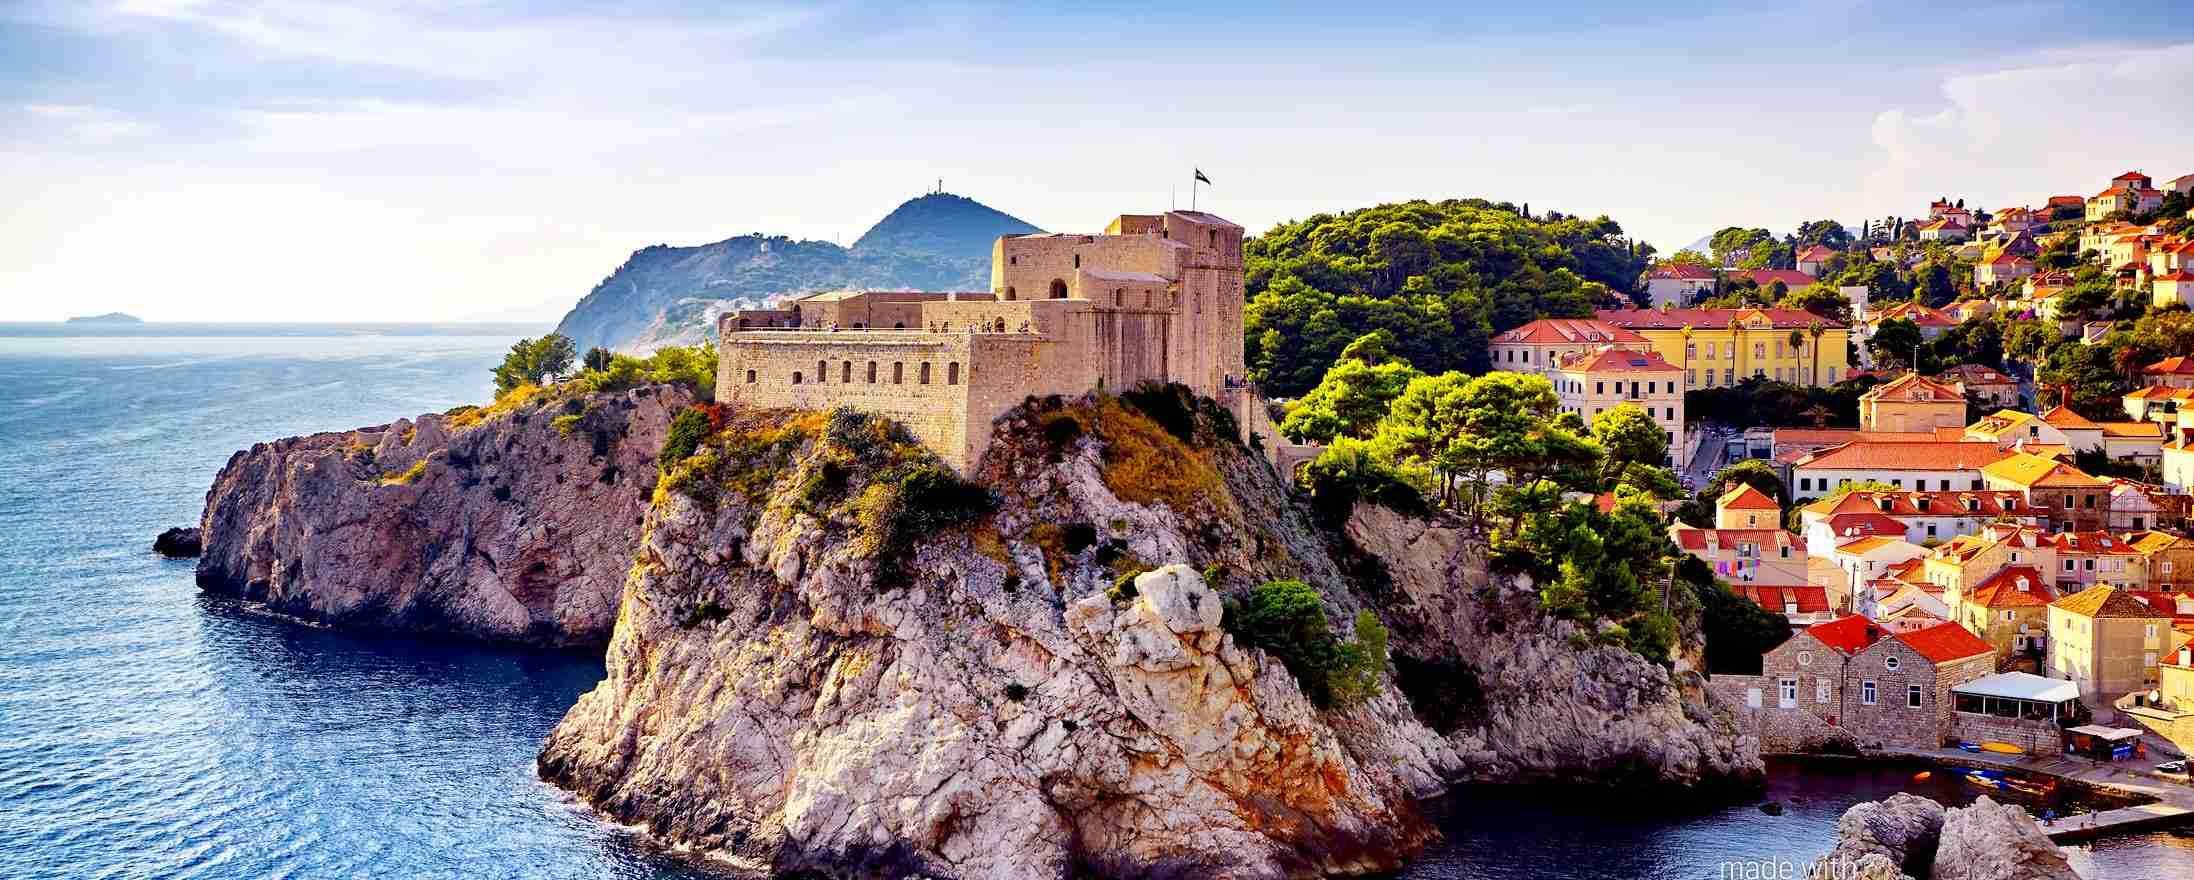 Jewels of the Dalmatian Coast 25